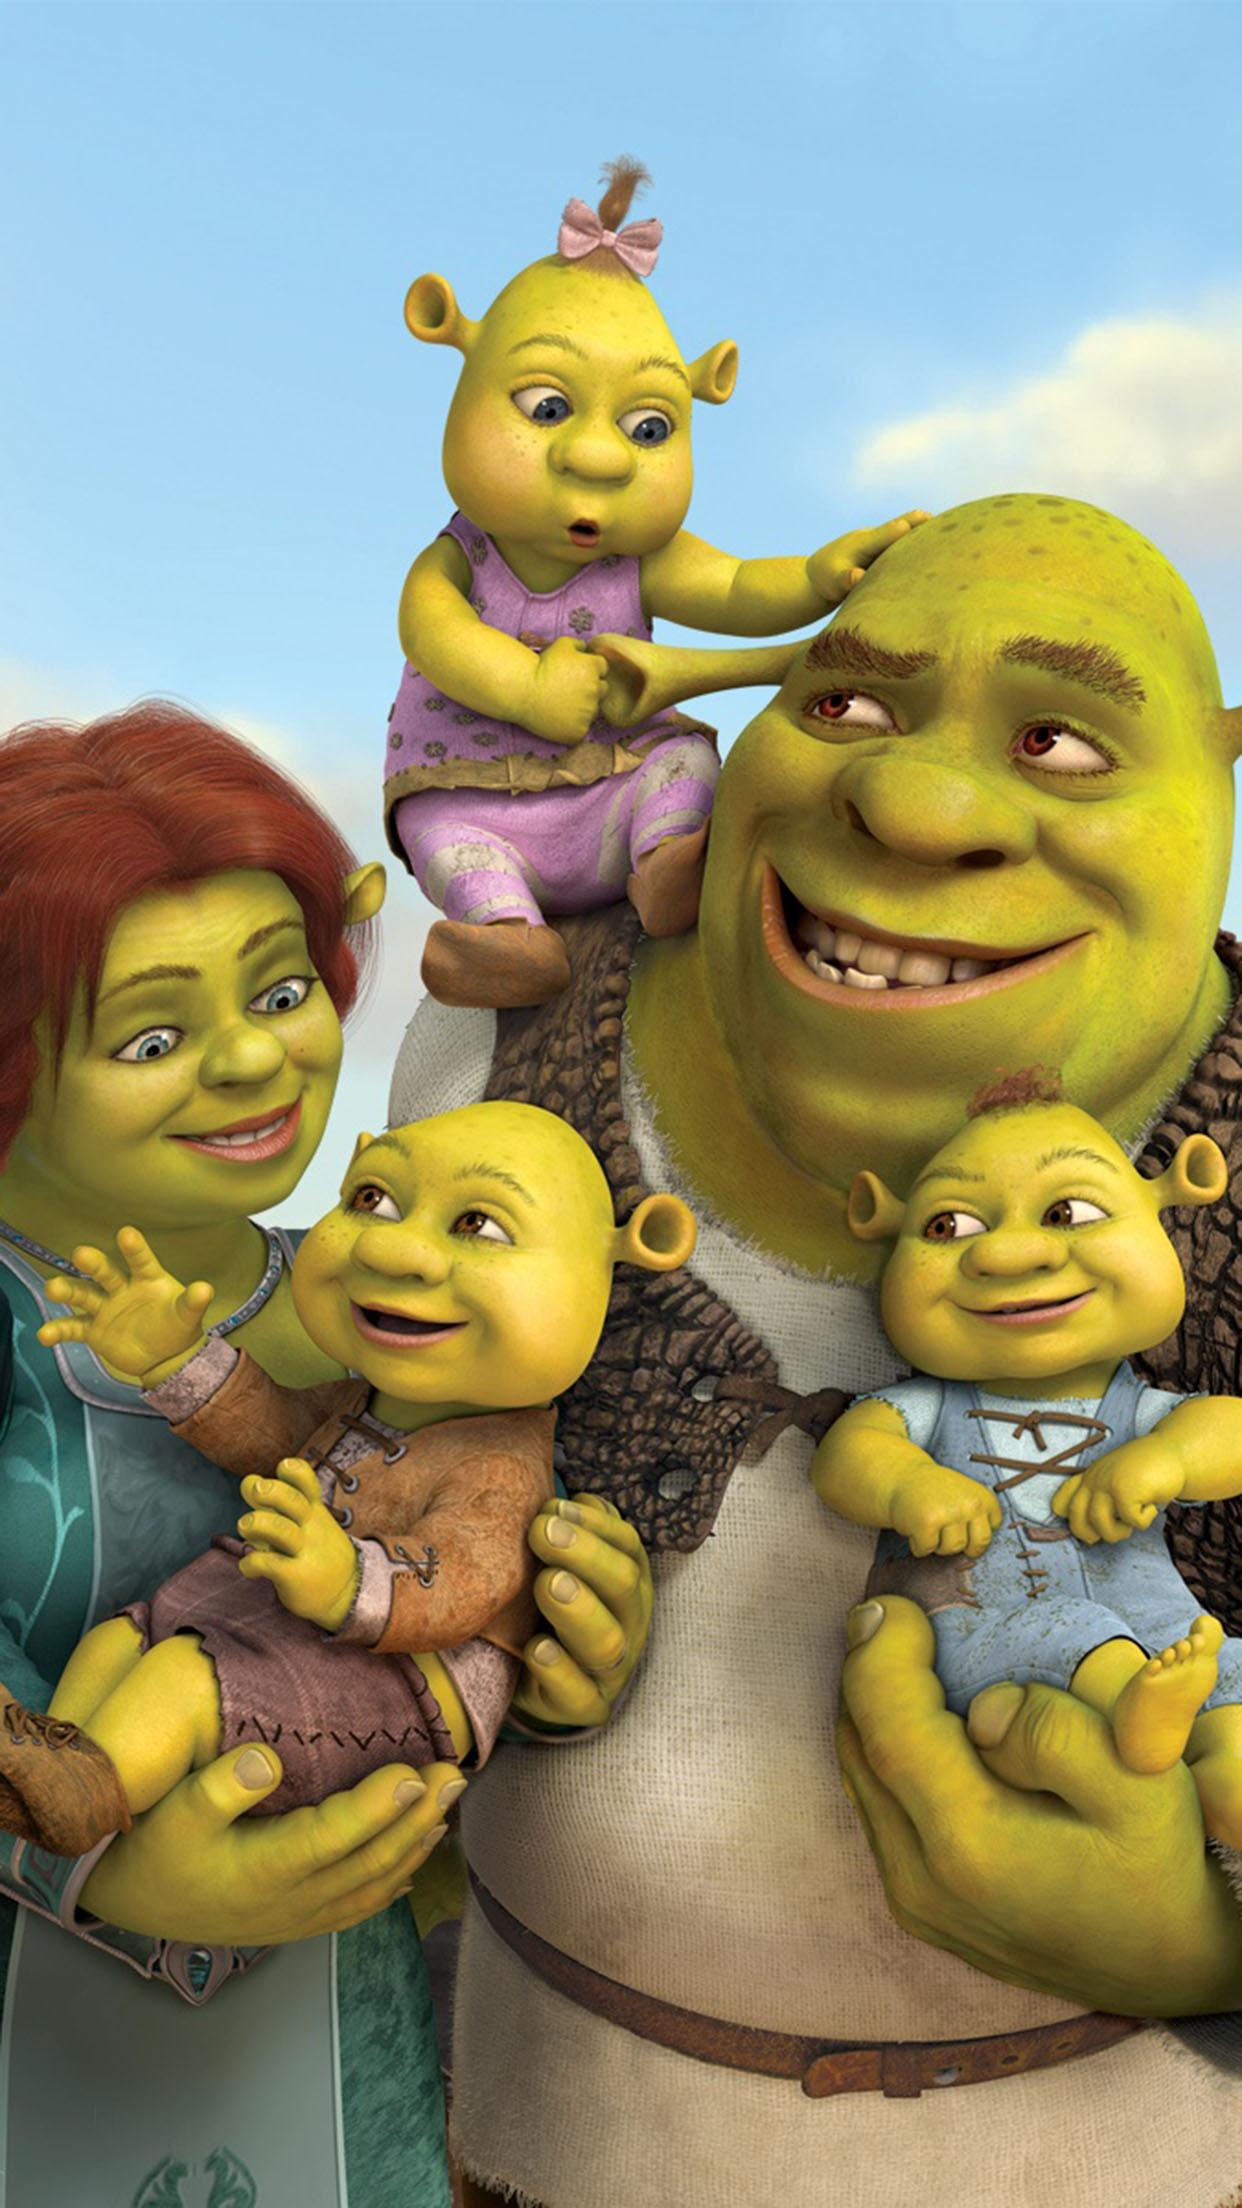 Shrek Shrek and Fiona s babies 3Wallpapers iPhone Parallax Shrek and Fionas babies